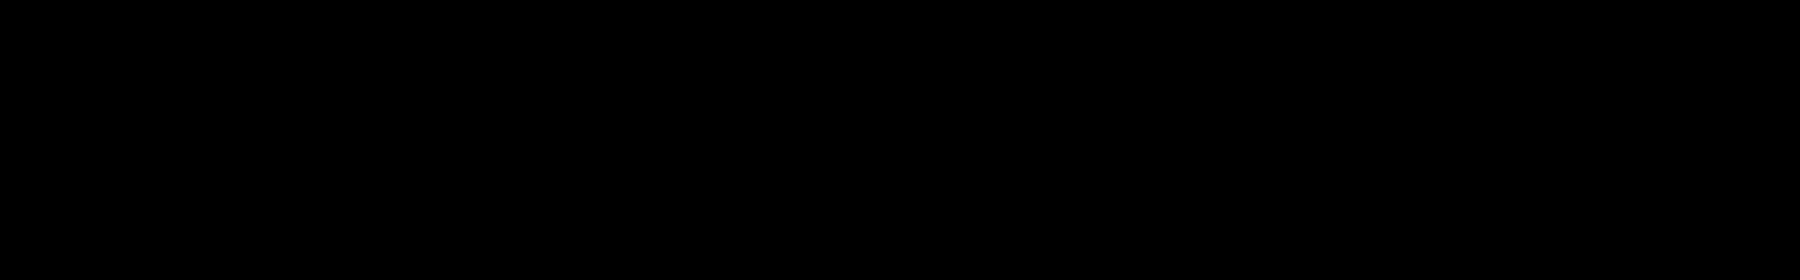 SOR – Deeper Sylenth1 Sounds audio waveform